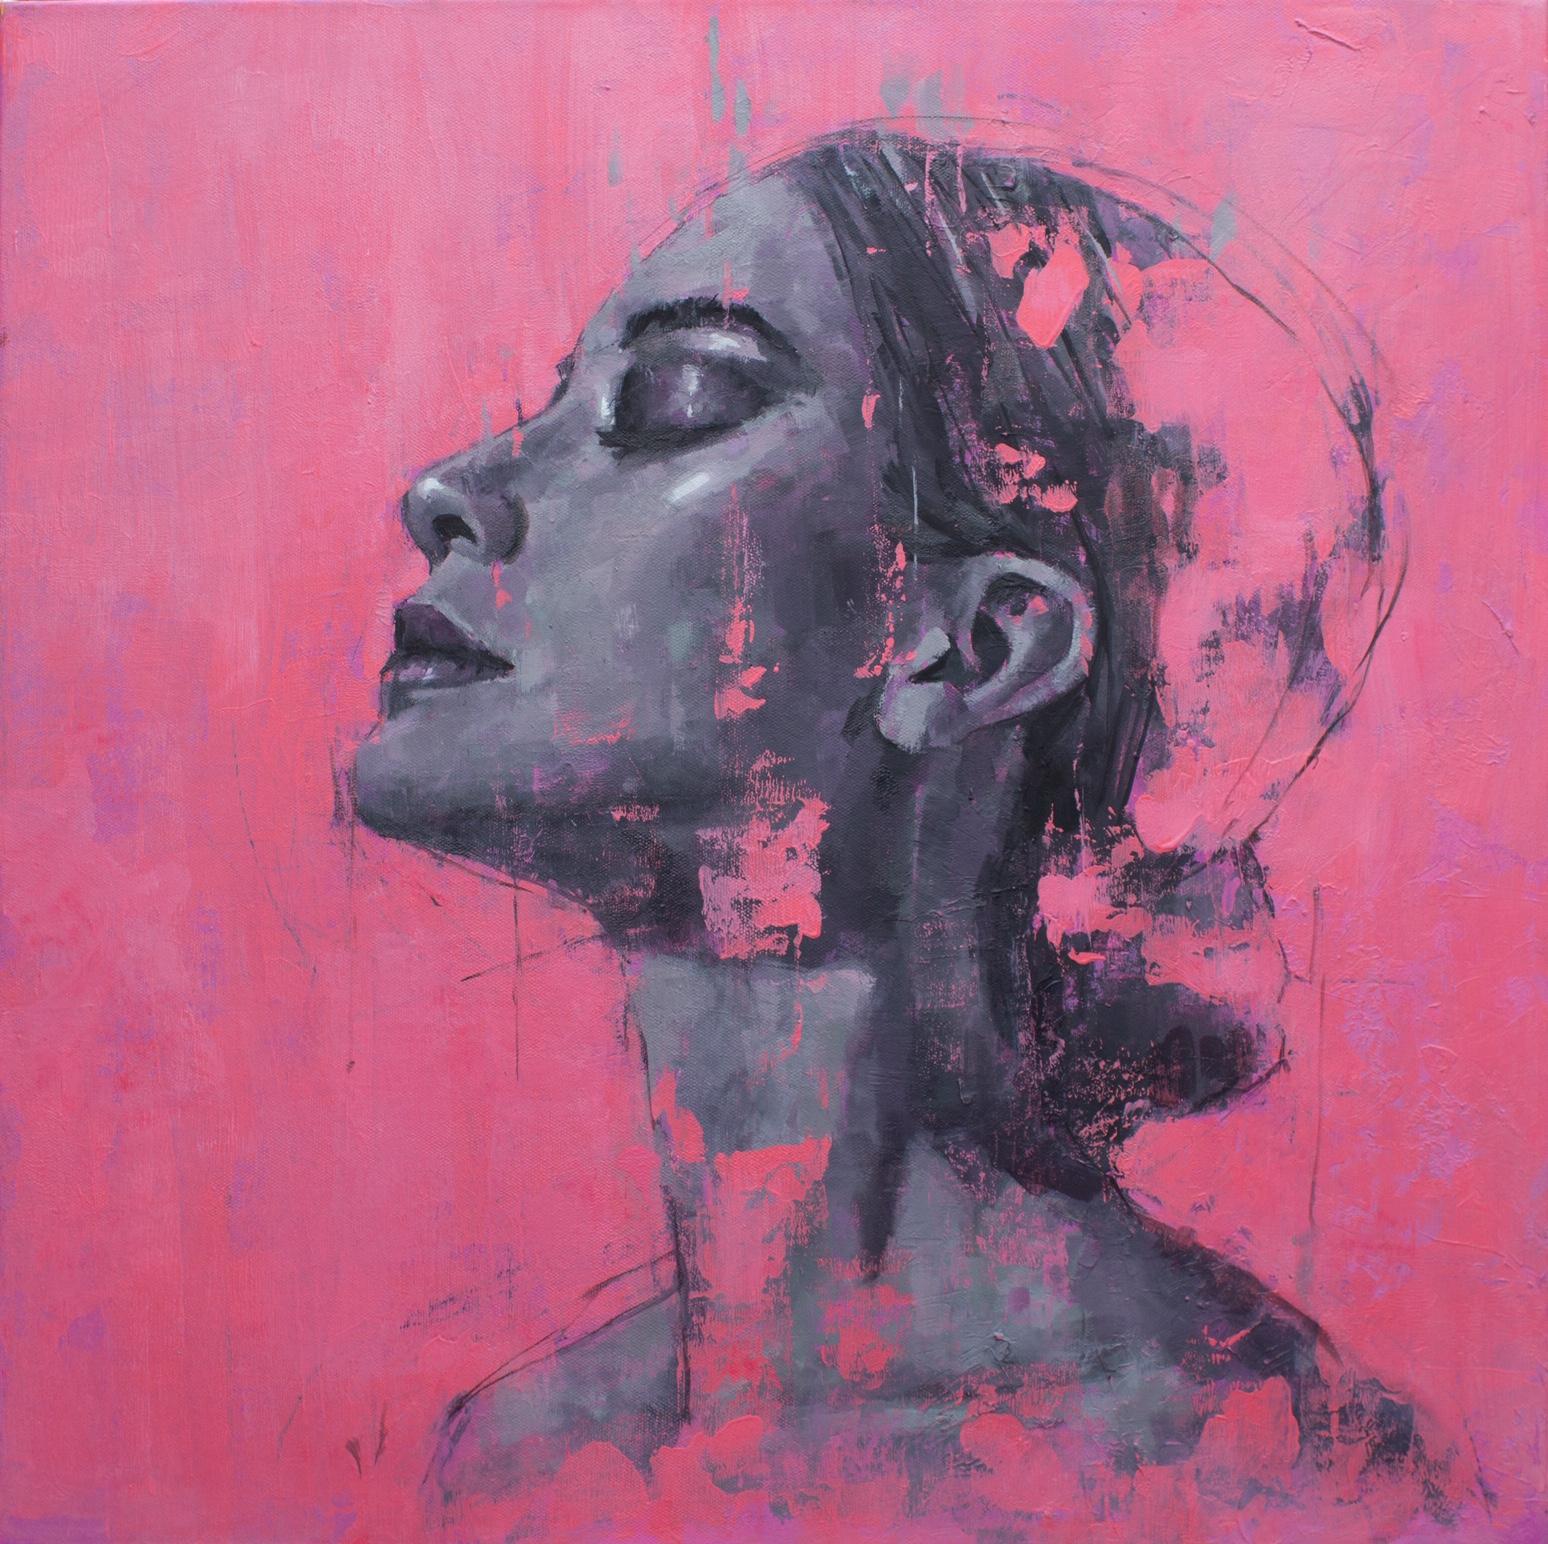 Portrait on Pink No.2 - Oil painting by  English Artist Jamel Akib